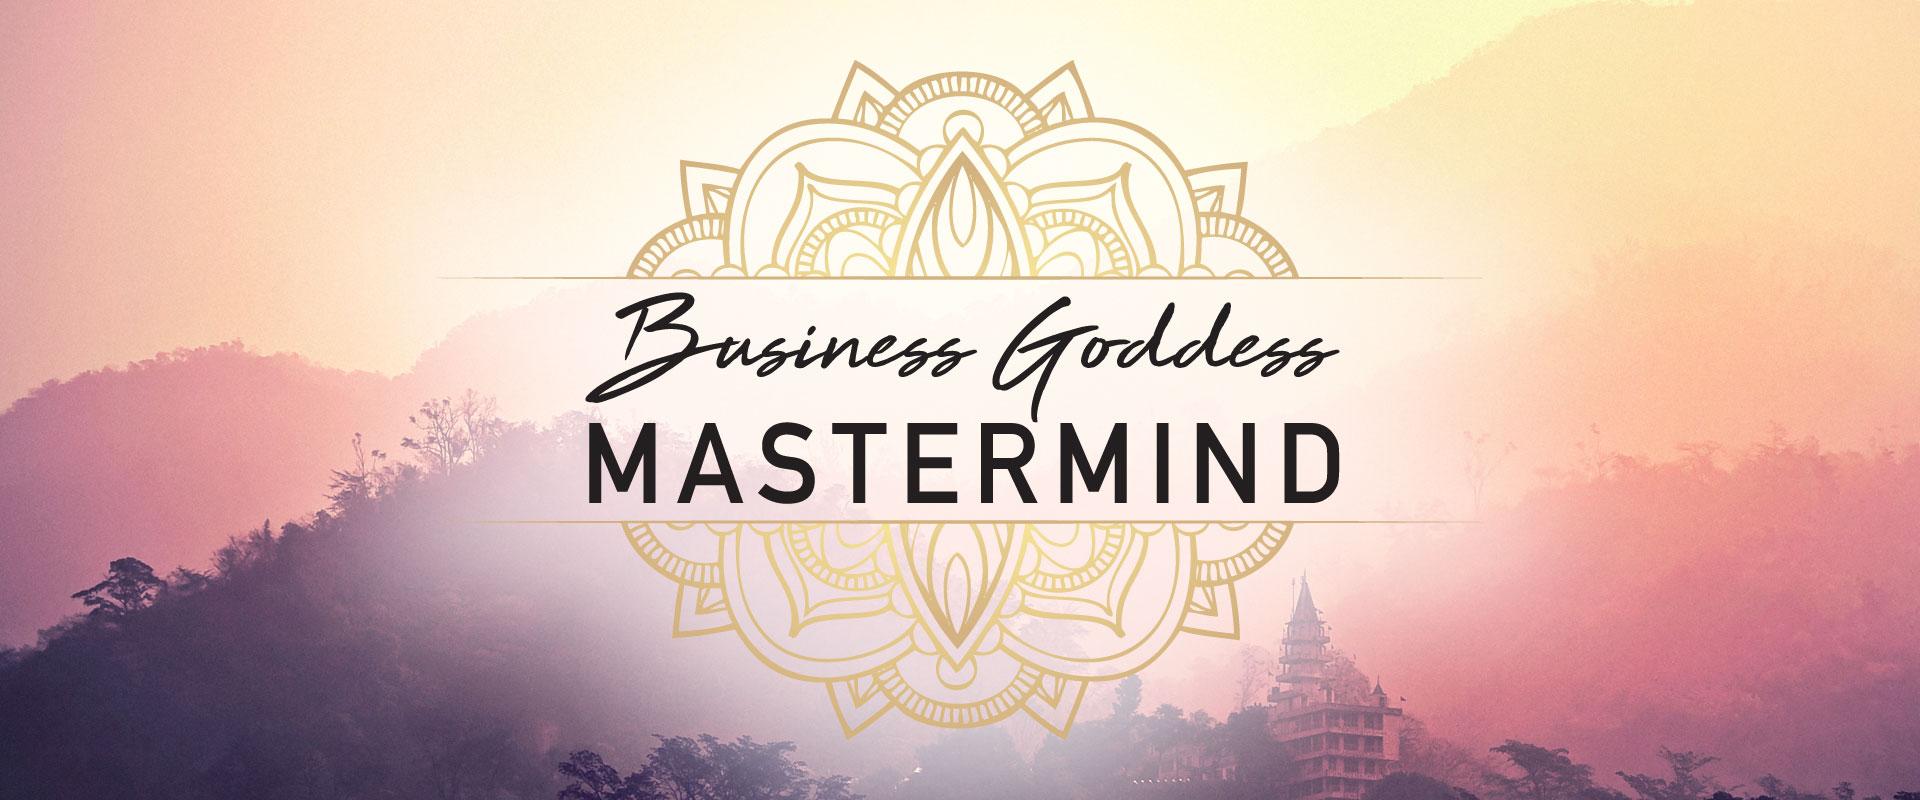 BusinessGoddessMastermindBanner.jpg